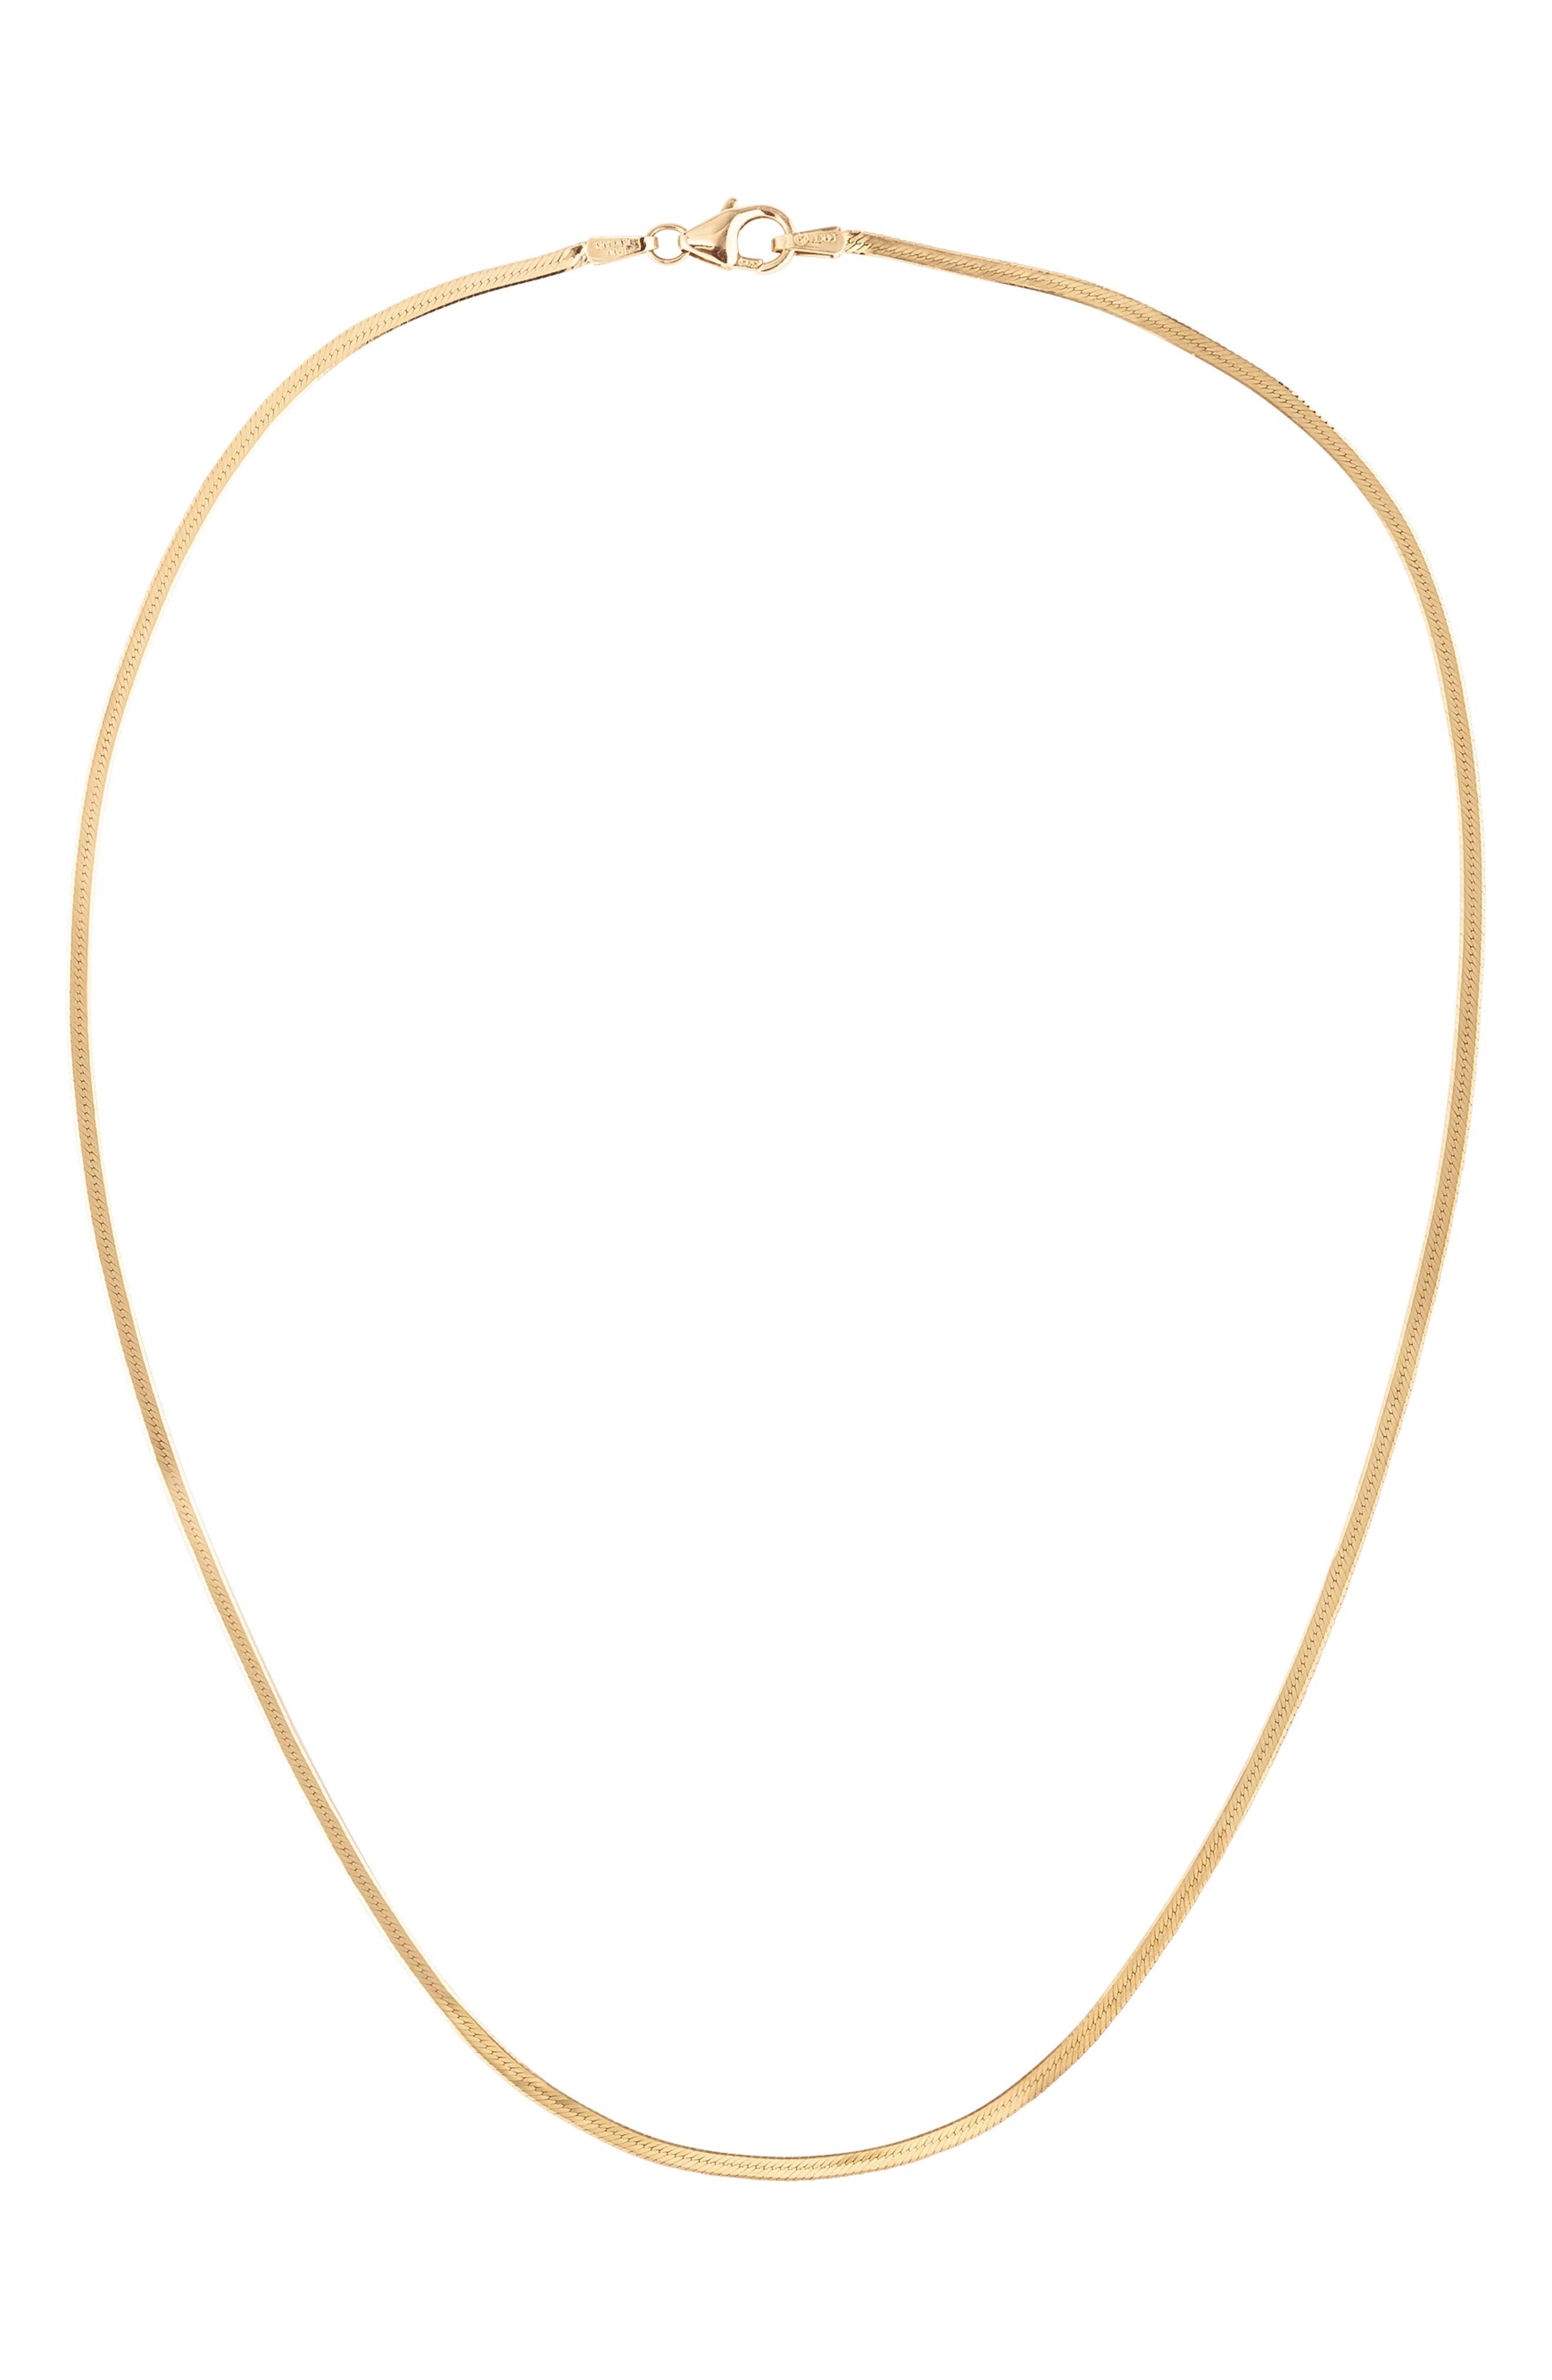 Thin Liquid Gold Choker Necklace